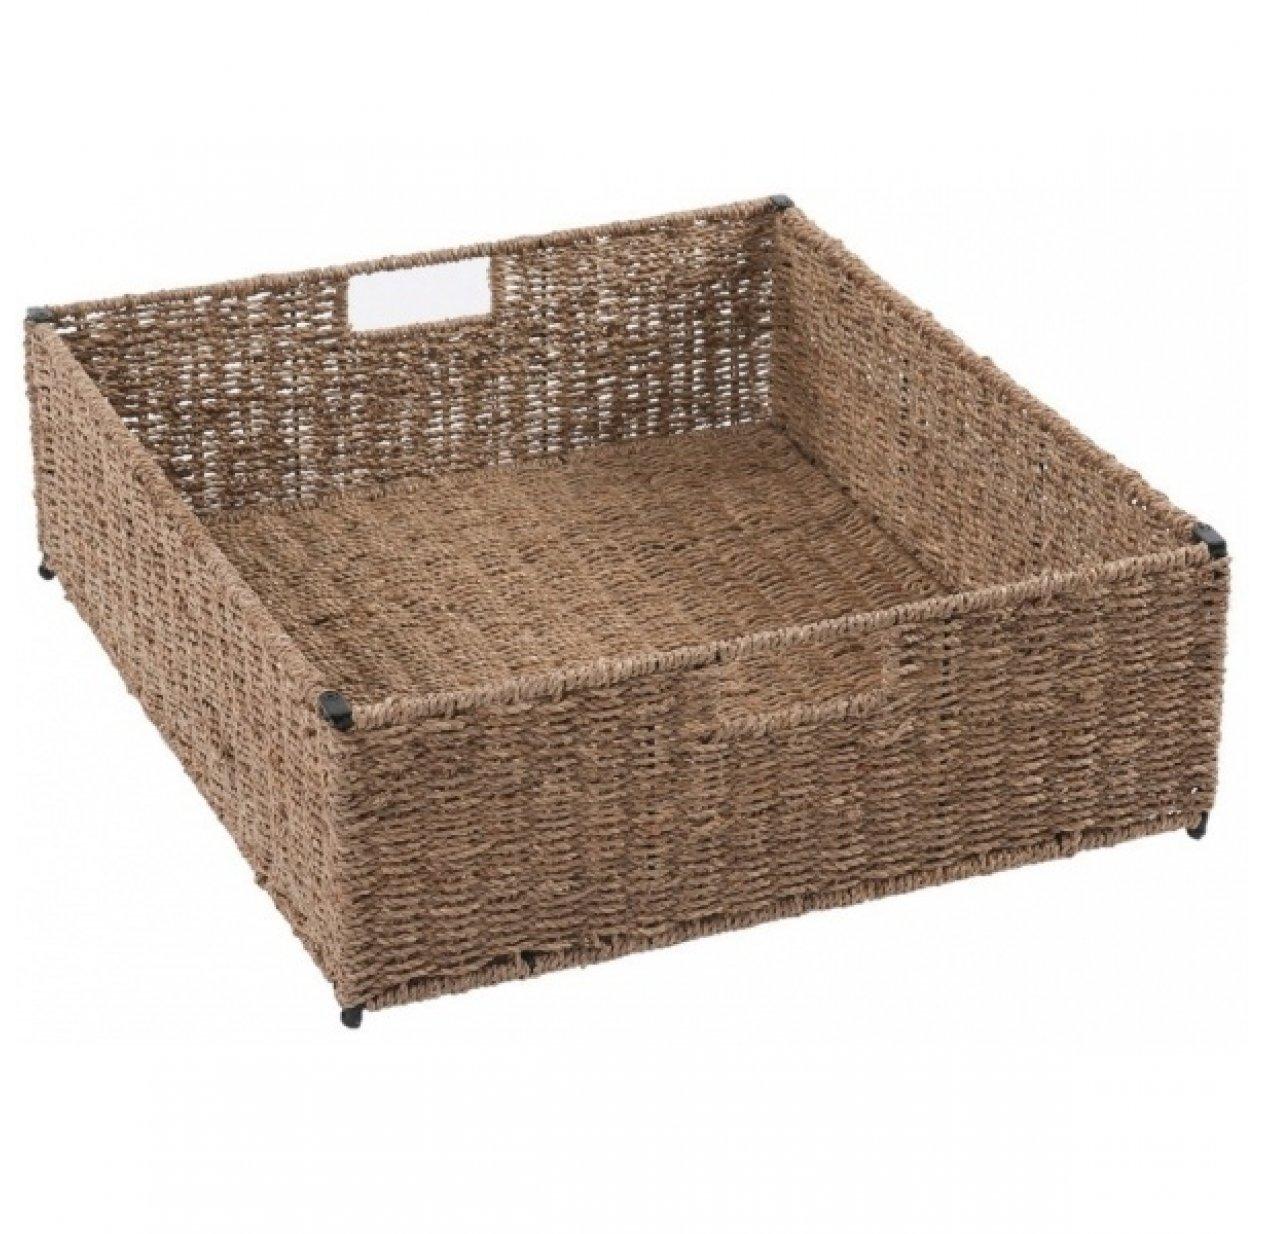 grand panier naturel pour tables langer comfort quax. Black Bedroom Furniture Sets. Home Design Ideas